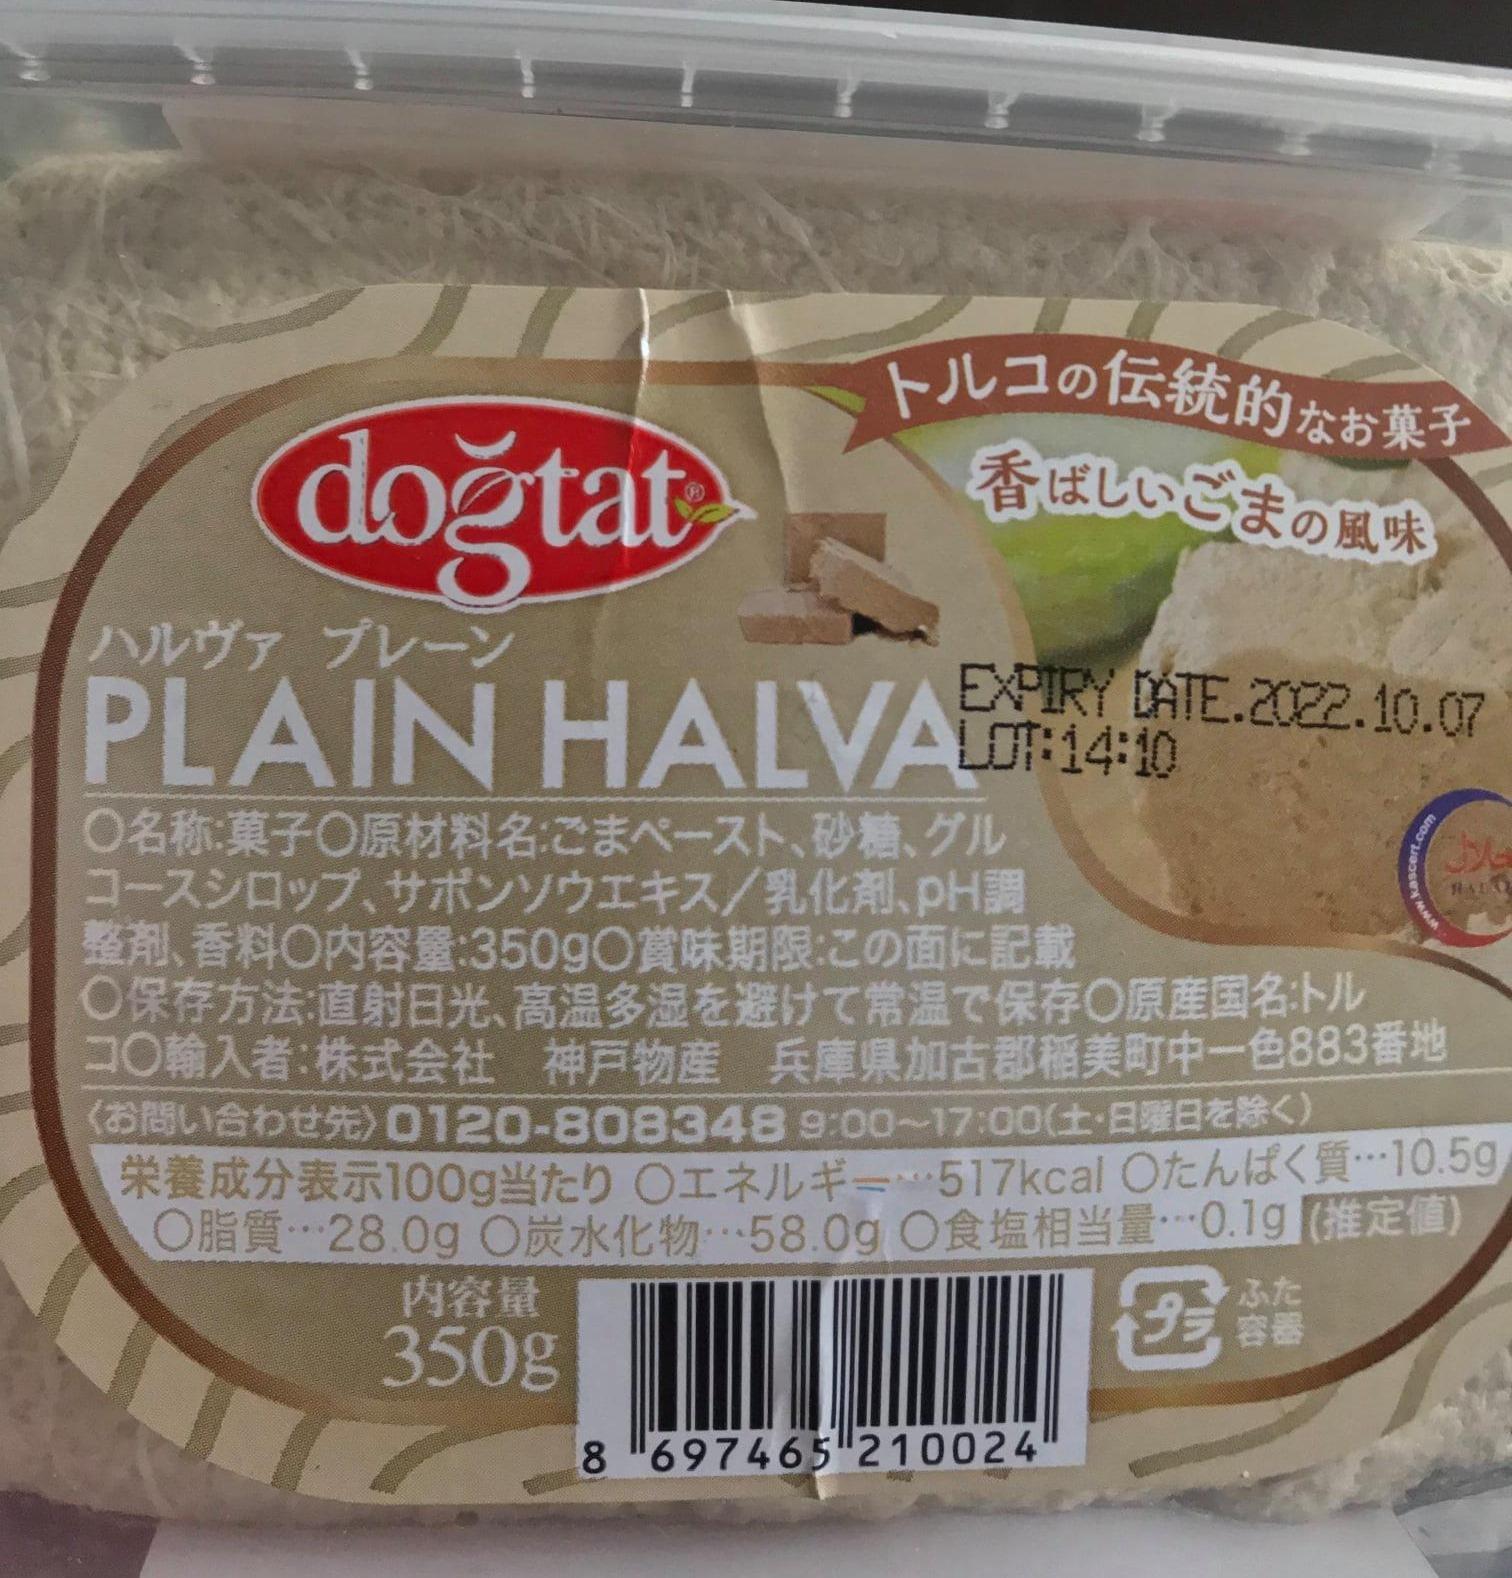 Dogtat Plain Halva